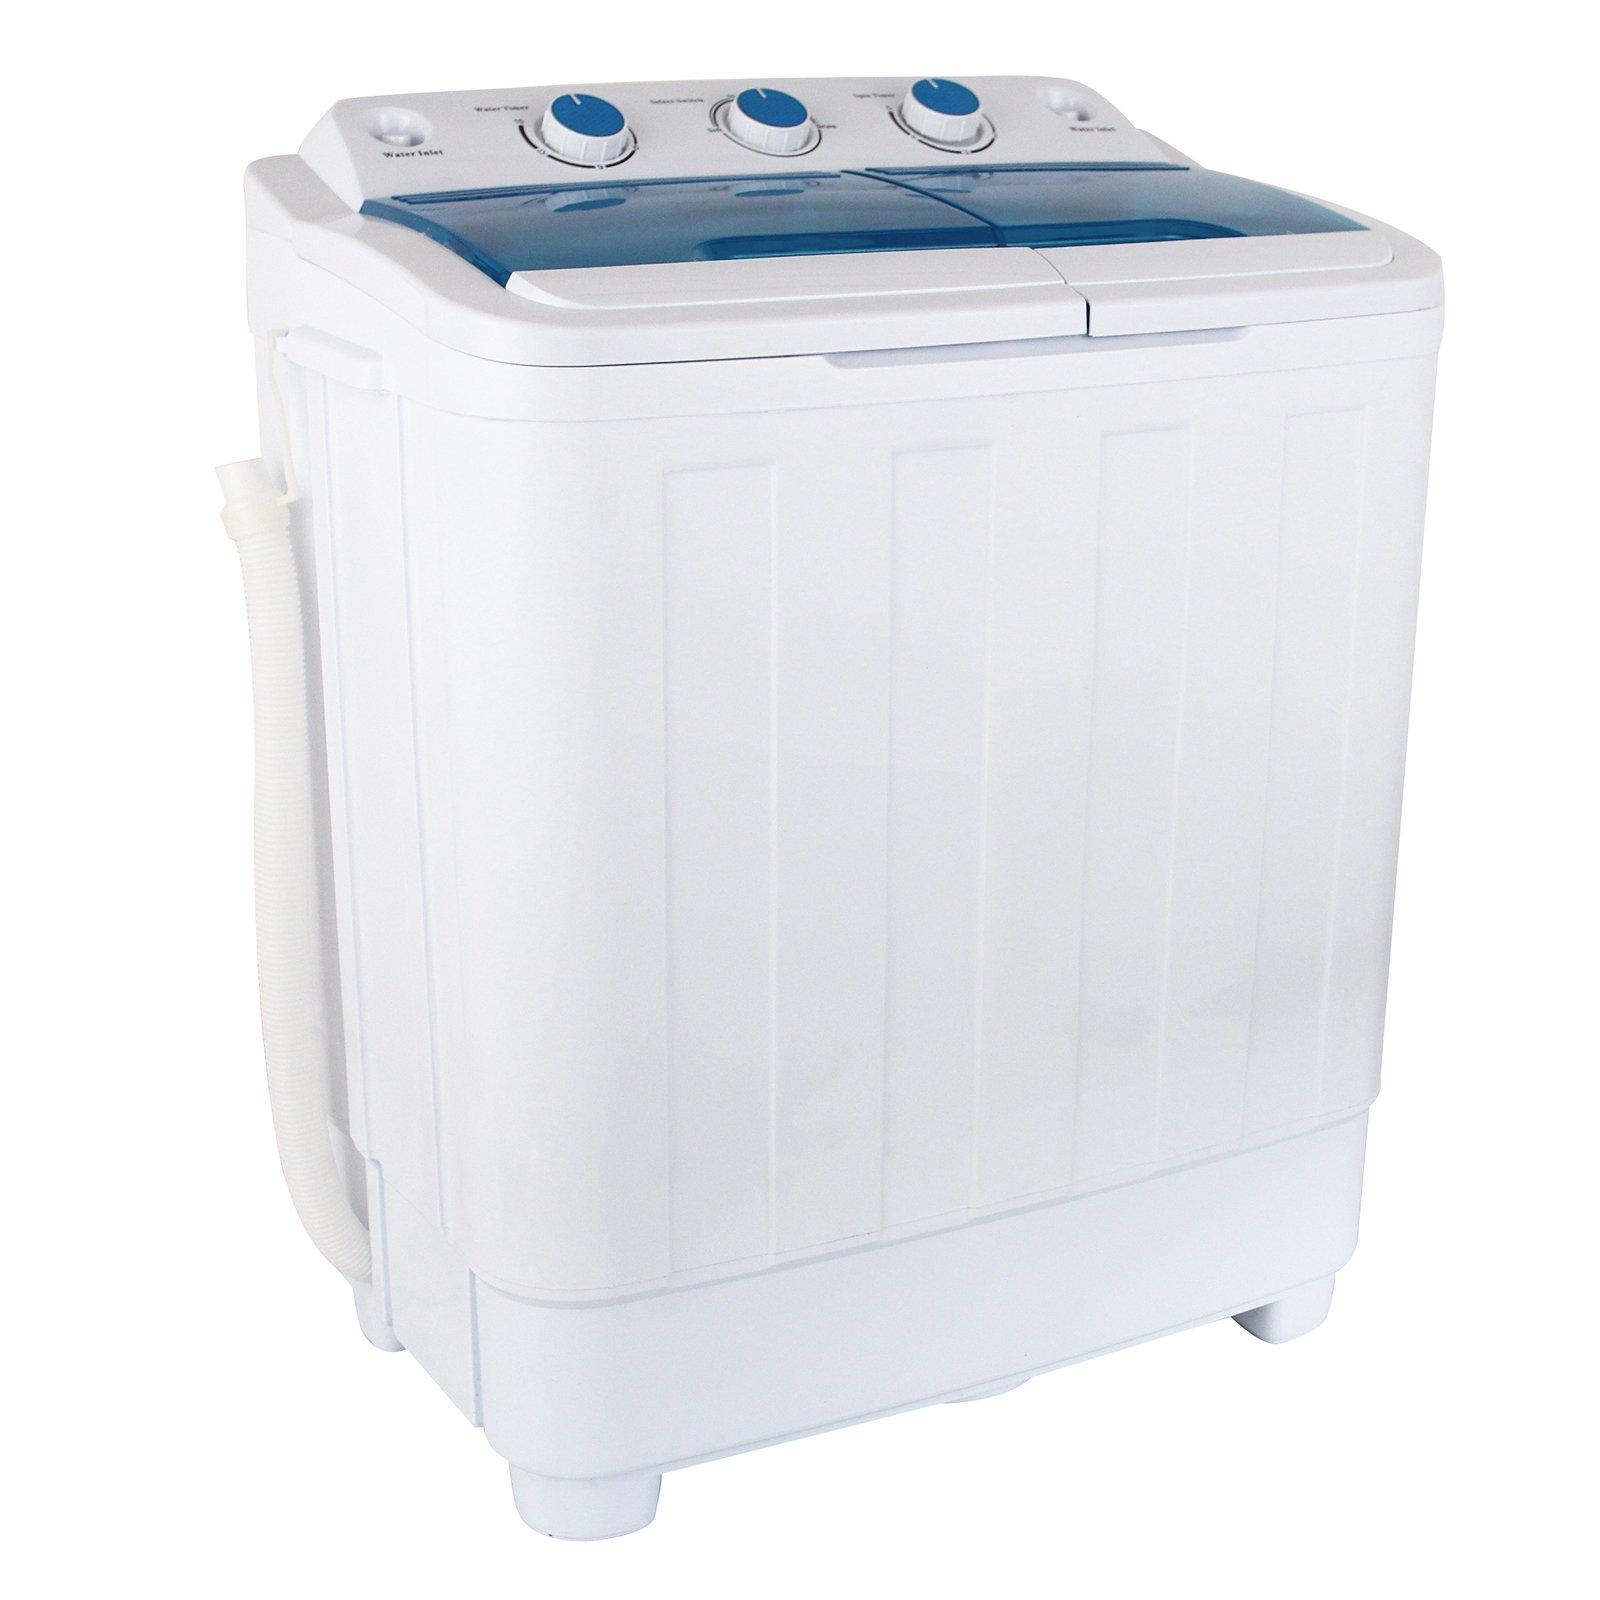 KUPPET Portable Mini Compact Twin Tub Washing Machine Washer Spin Dryer 17Ibs Capacity